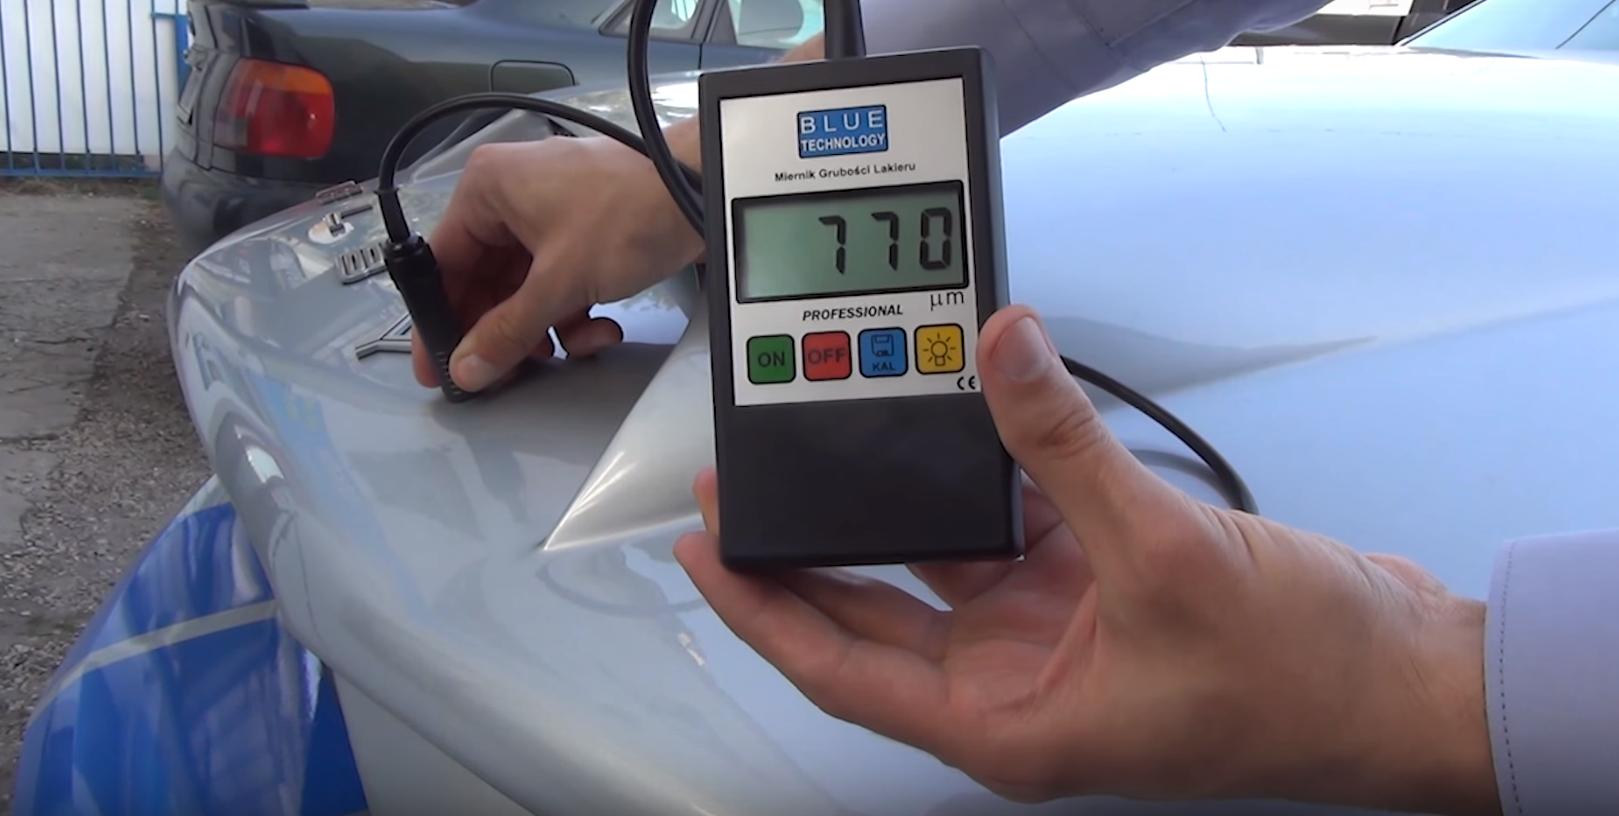 Coating thickness gauge - measurement of  car hood - 770 µm - body filler